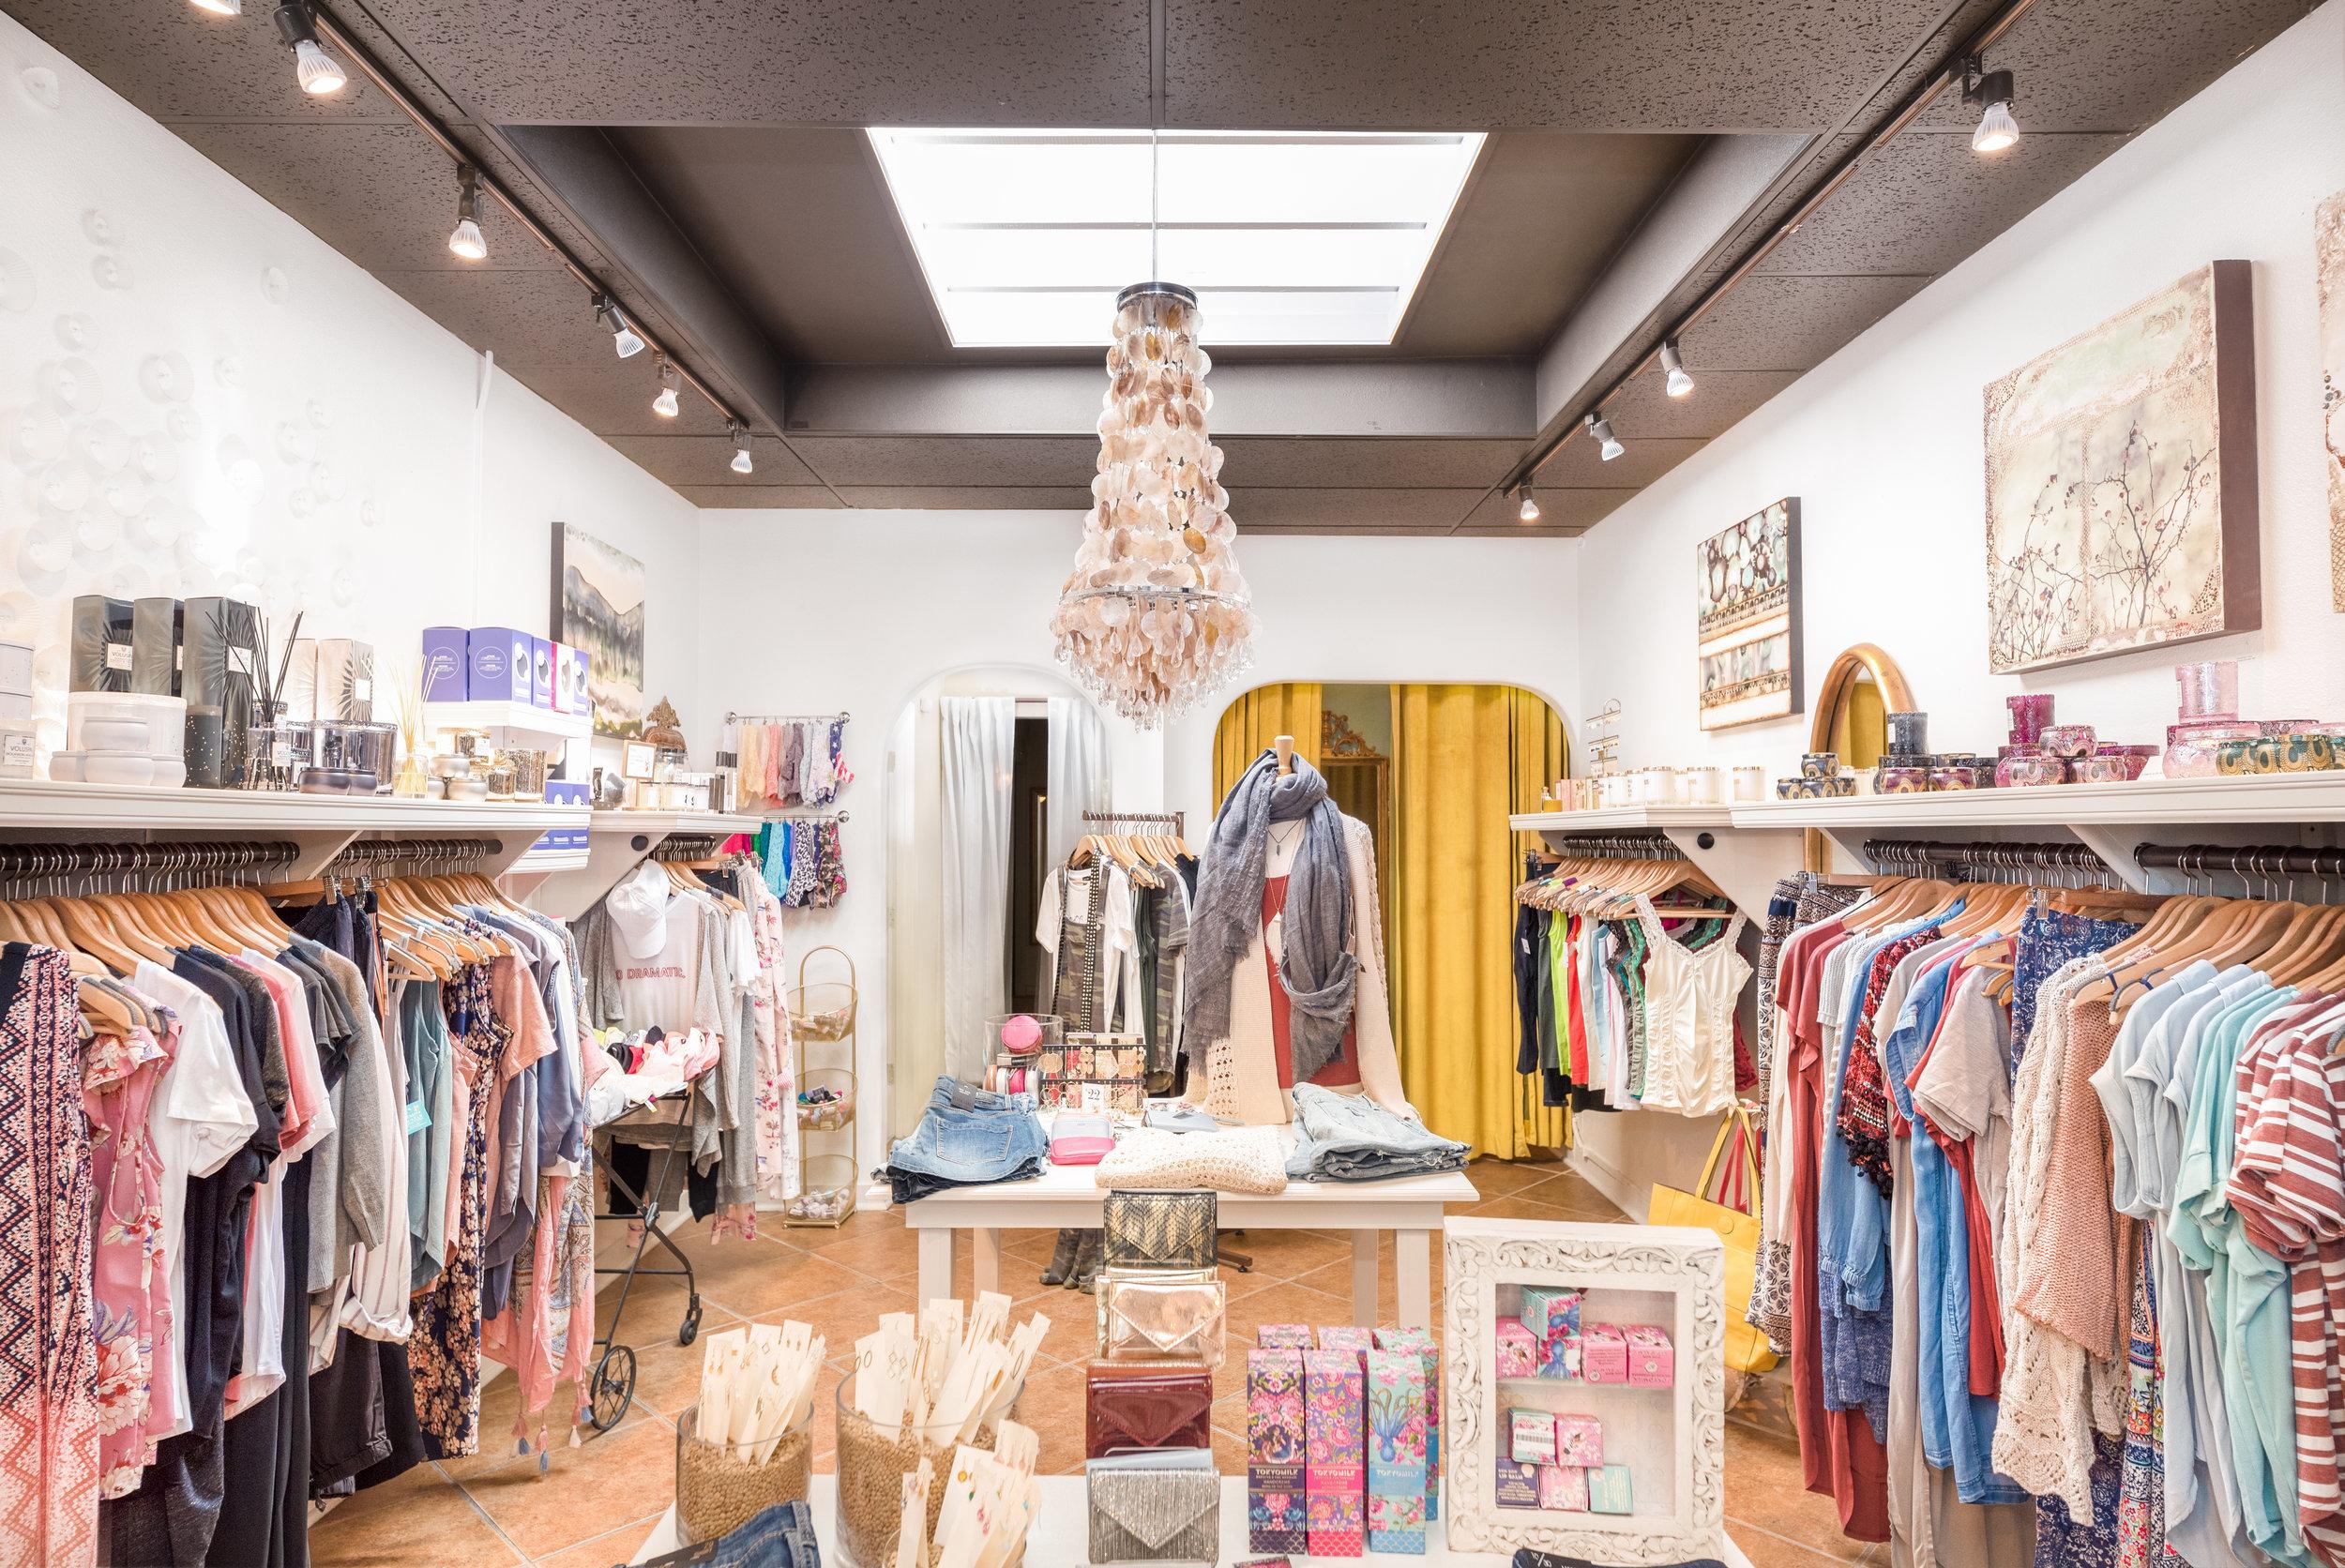 Vixen-Spa-Boutique-June, 19th, 2018 (10 of 14).jpg